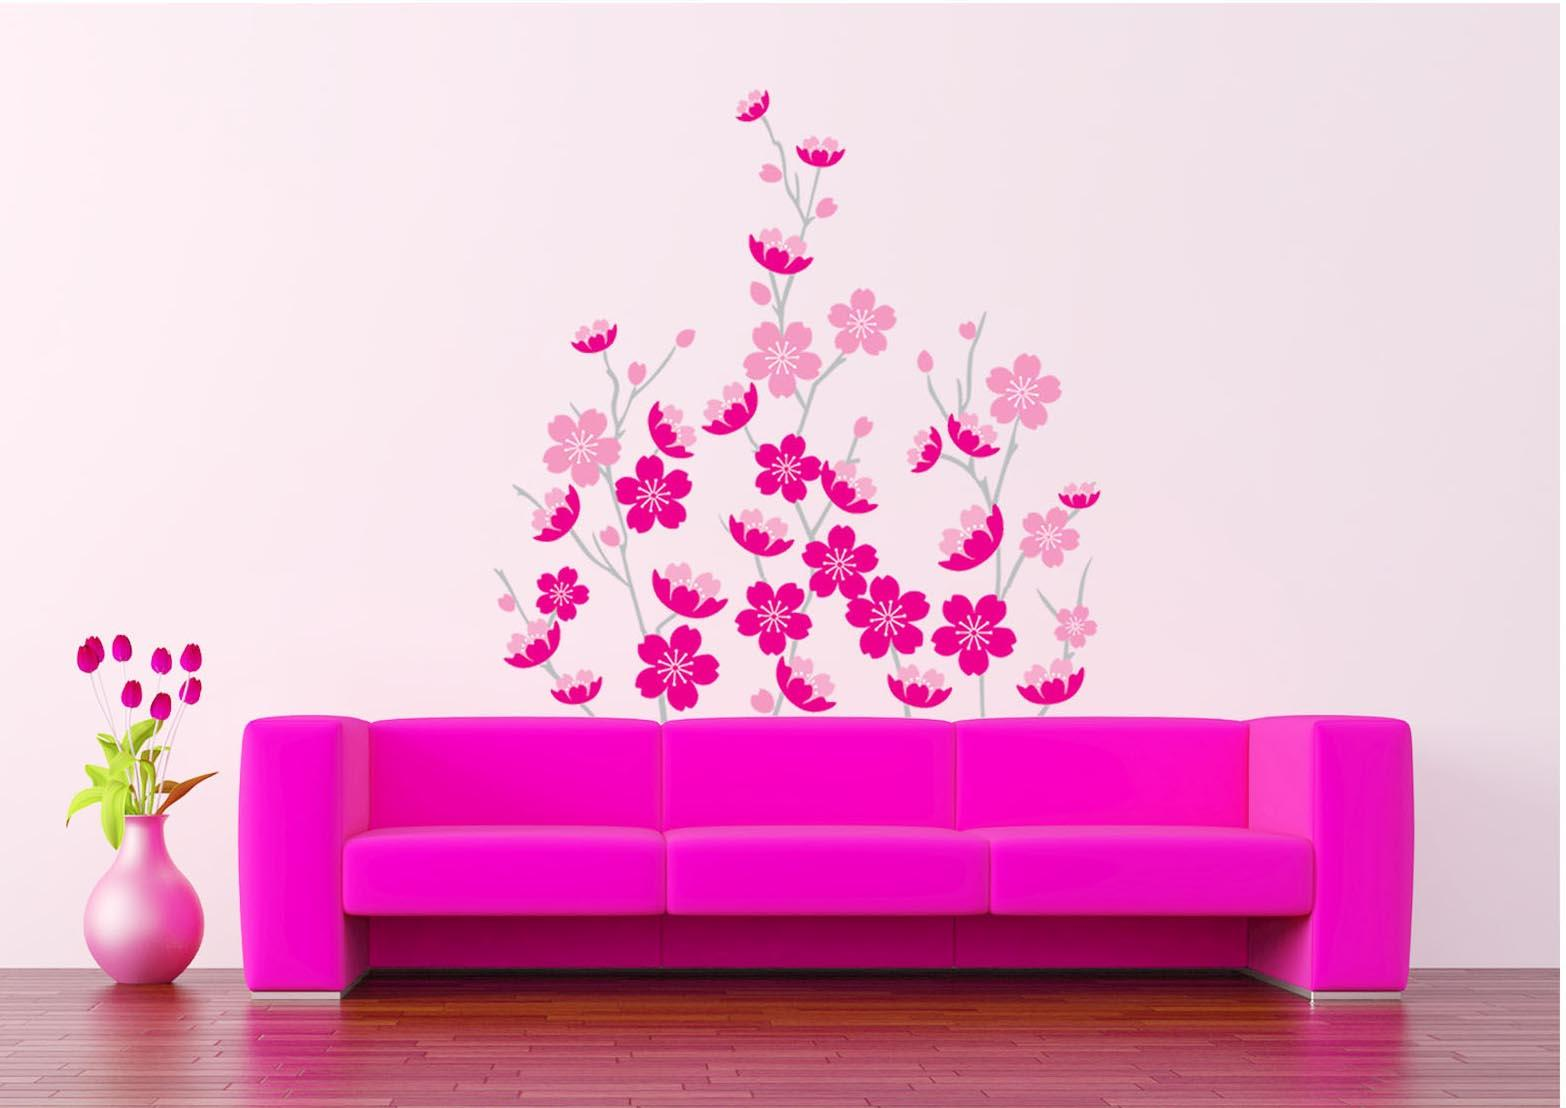 Pink Sakura Wall Art Decor Sticker Romantic Flowers Wallpaper Mural Poster  Bedroom Living Room Decoration Diy Art Home Decal Cool Wall Stickers Create  Wall ... Part 12